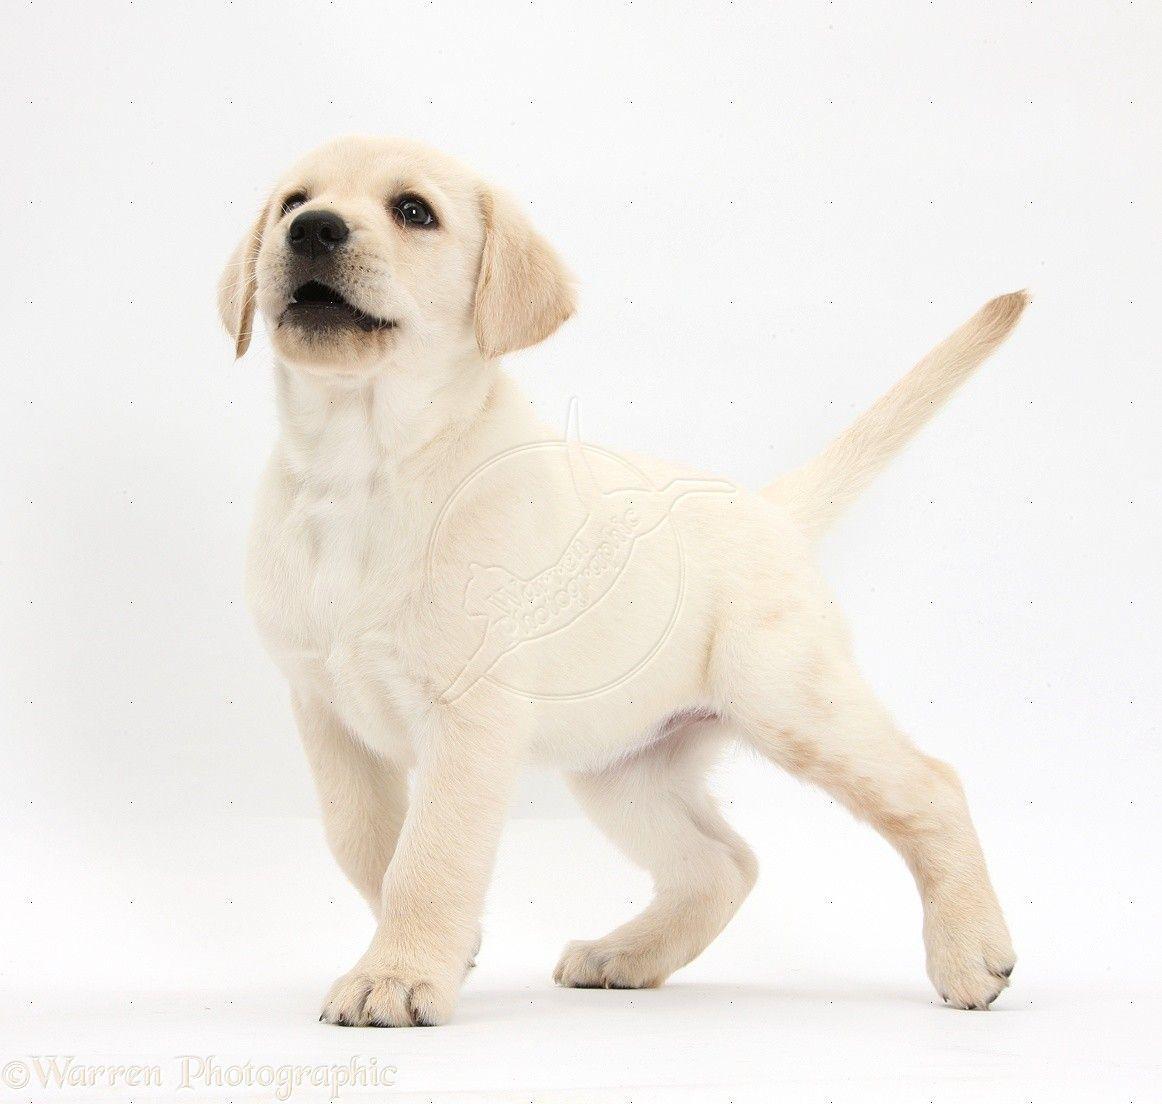 Dog Names Popular Male And Female Dog Names Pets World Unusual Dog Names Dog Names Female Dog Names